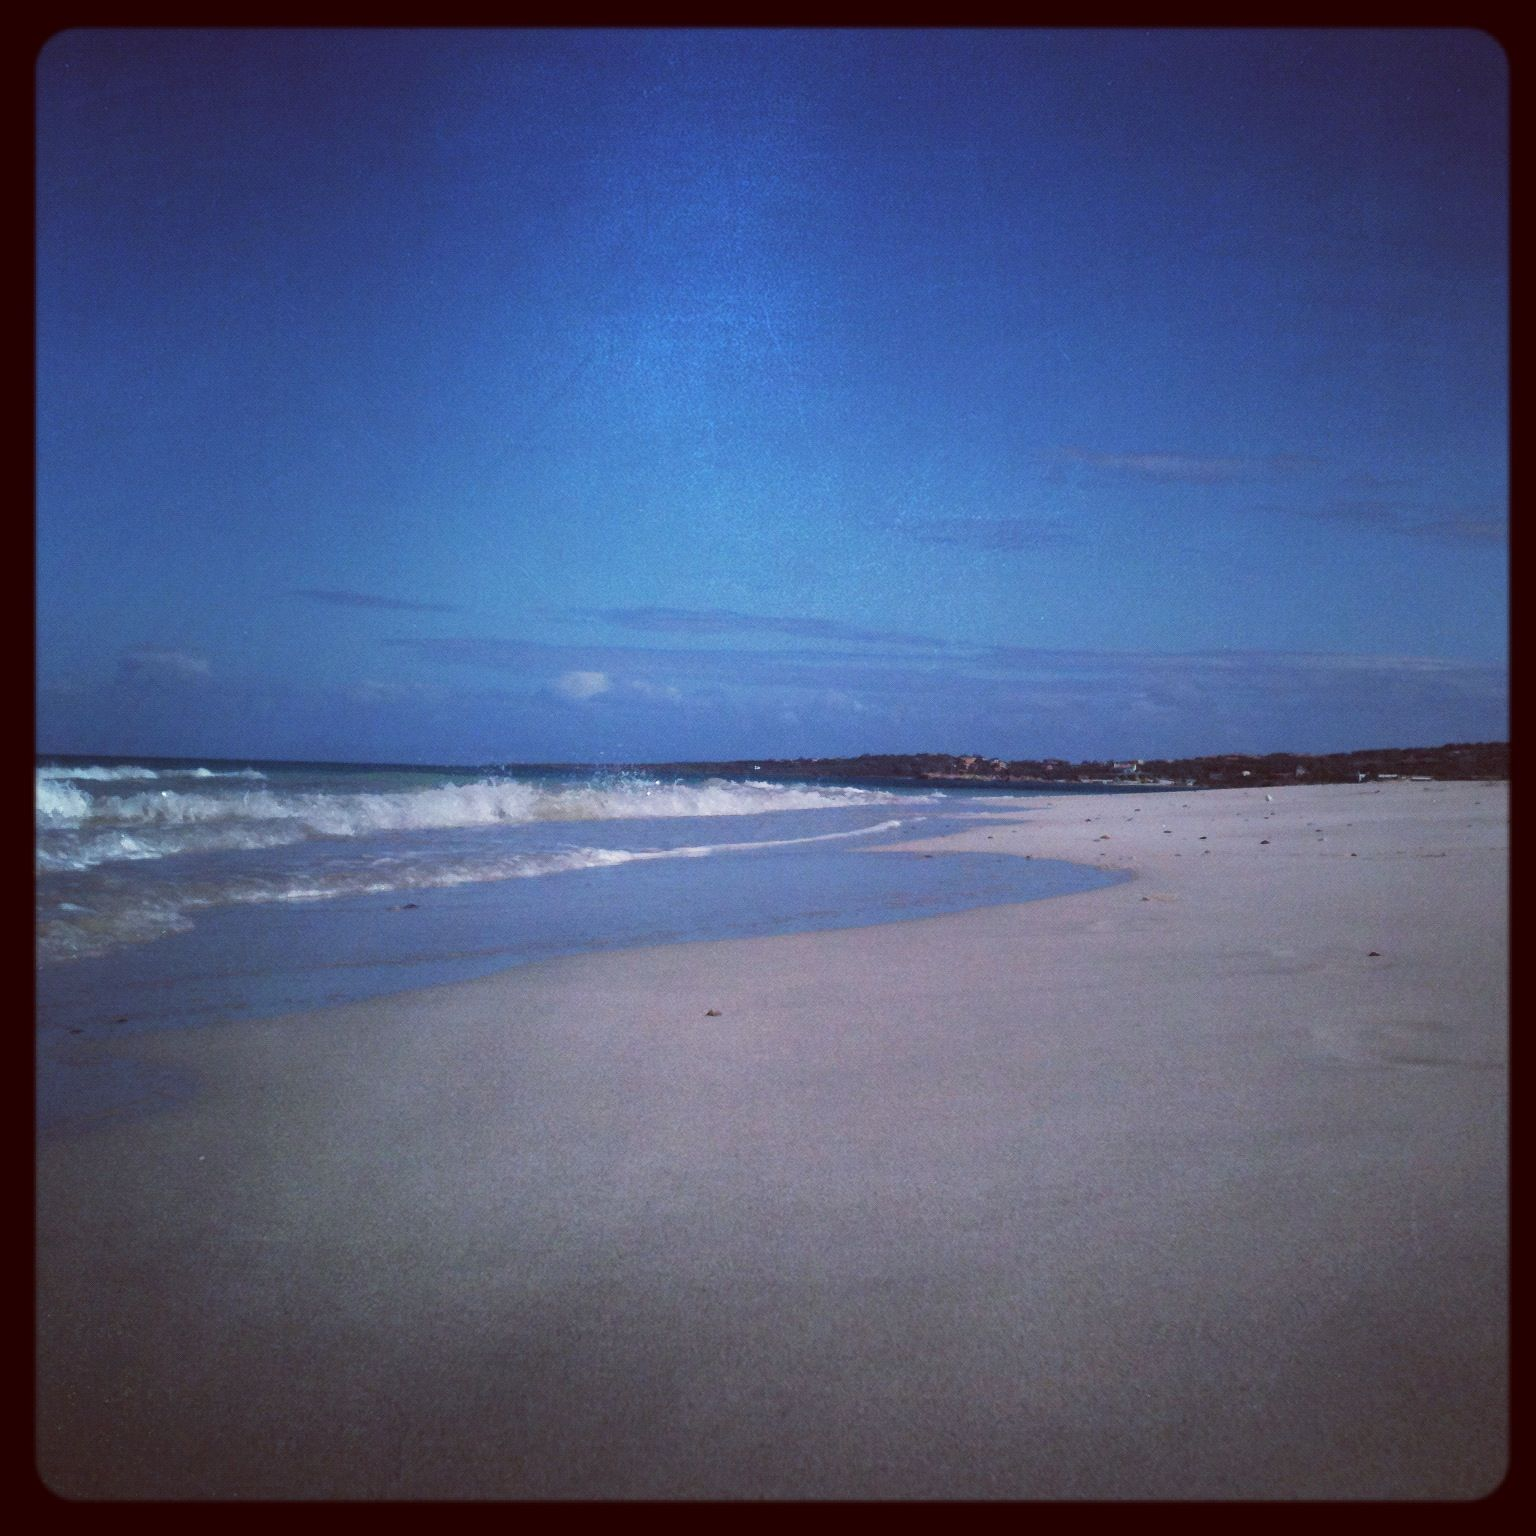 Pasqua 2013 - Spiaggia deserta ;)